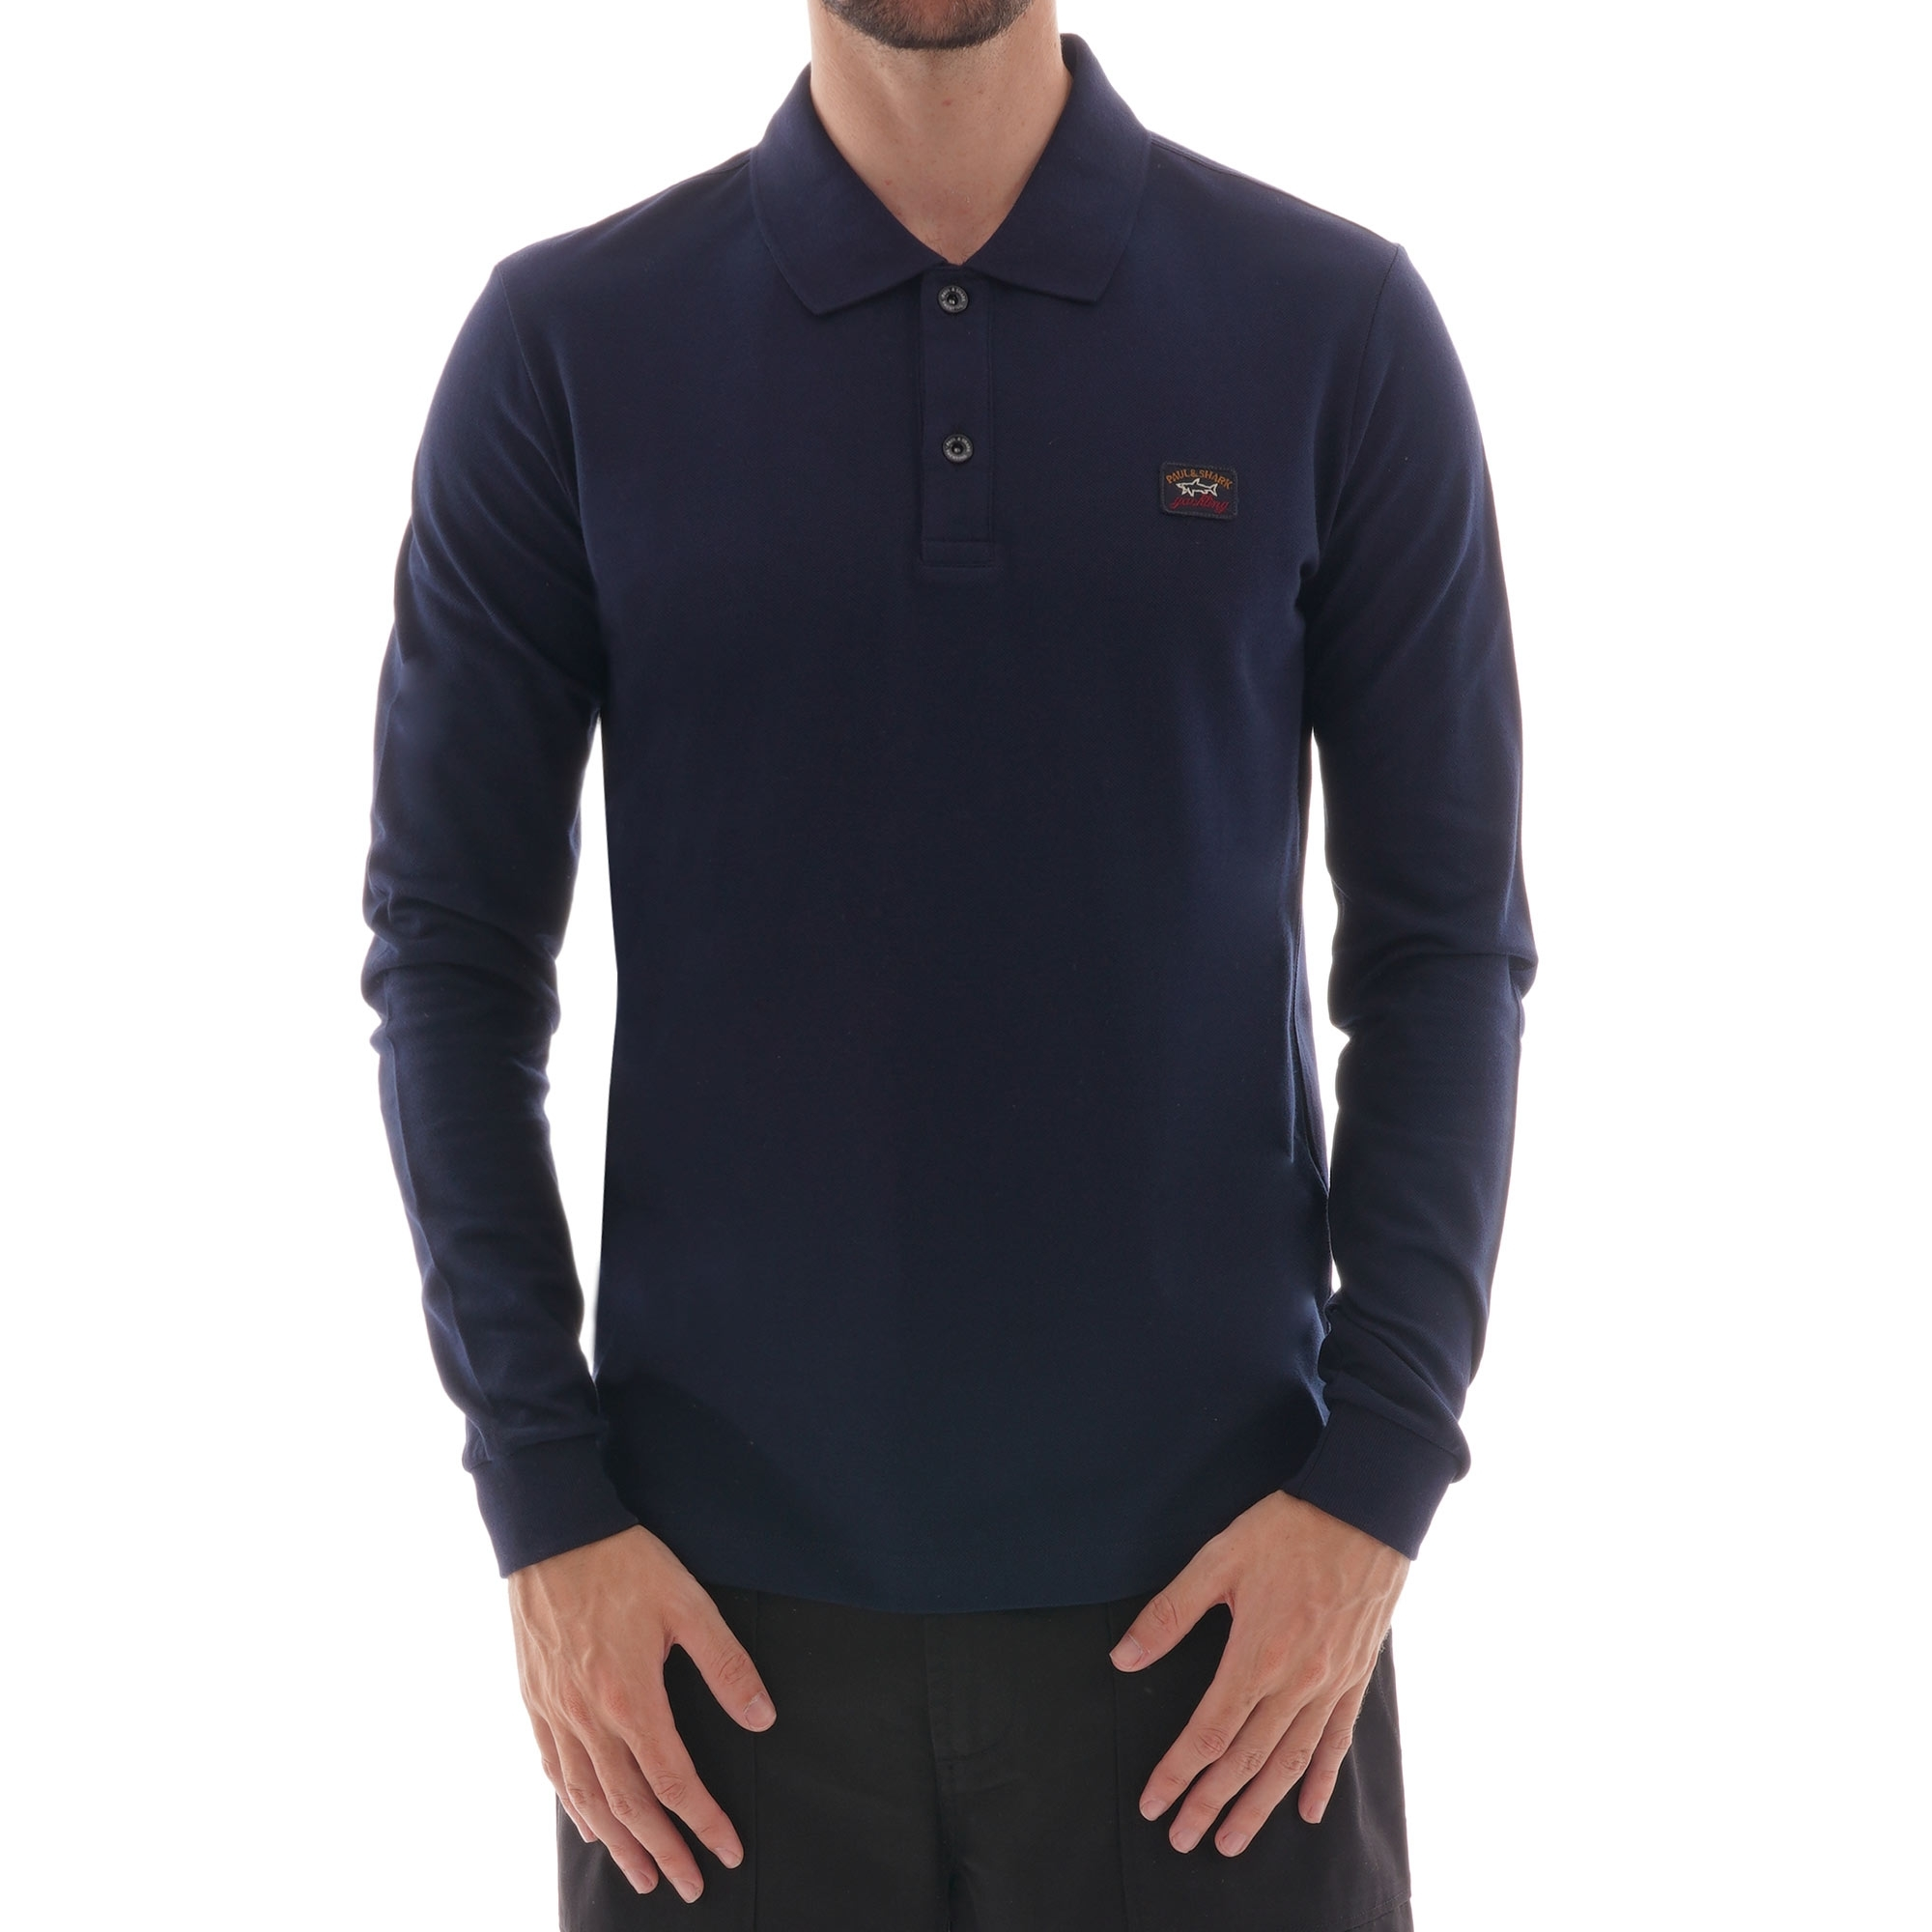 Paul and Shark Men/'s Long Sleeve Pique Cotton Polo Shirt